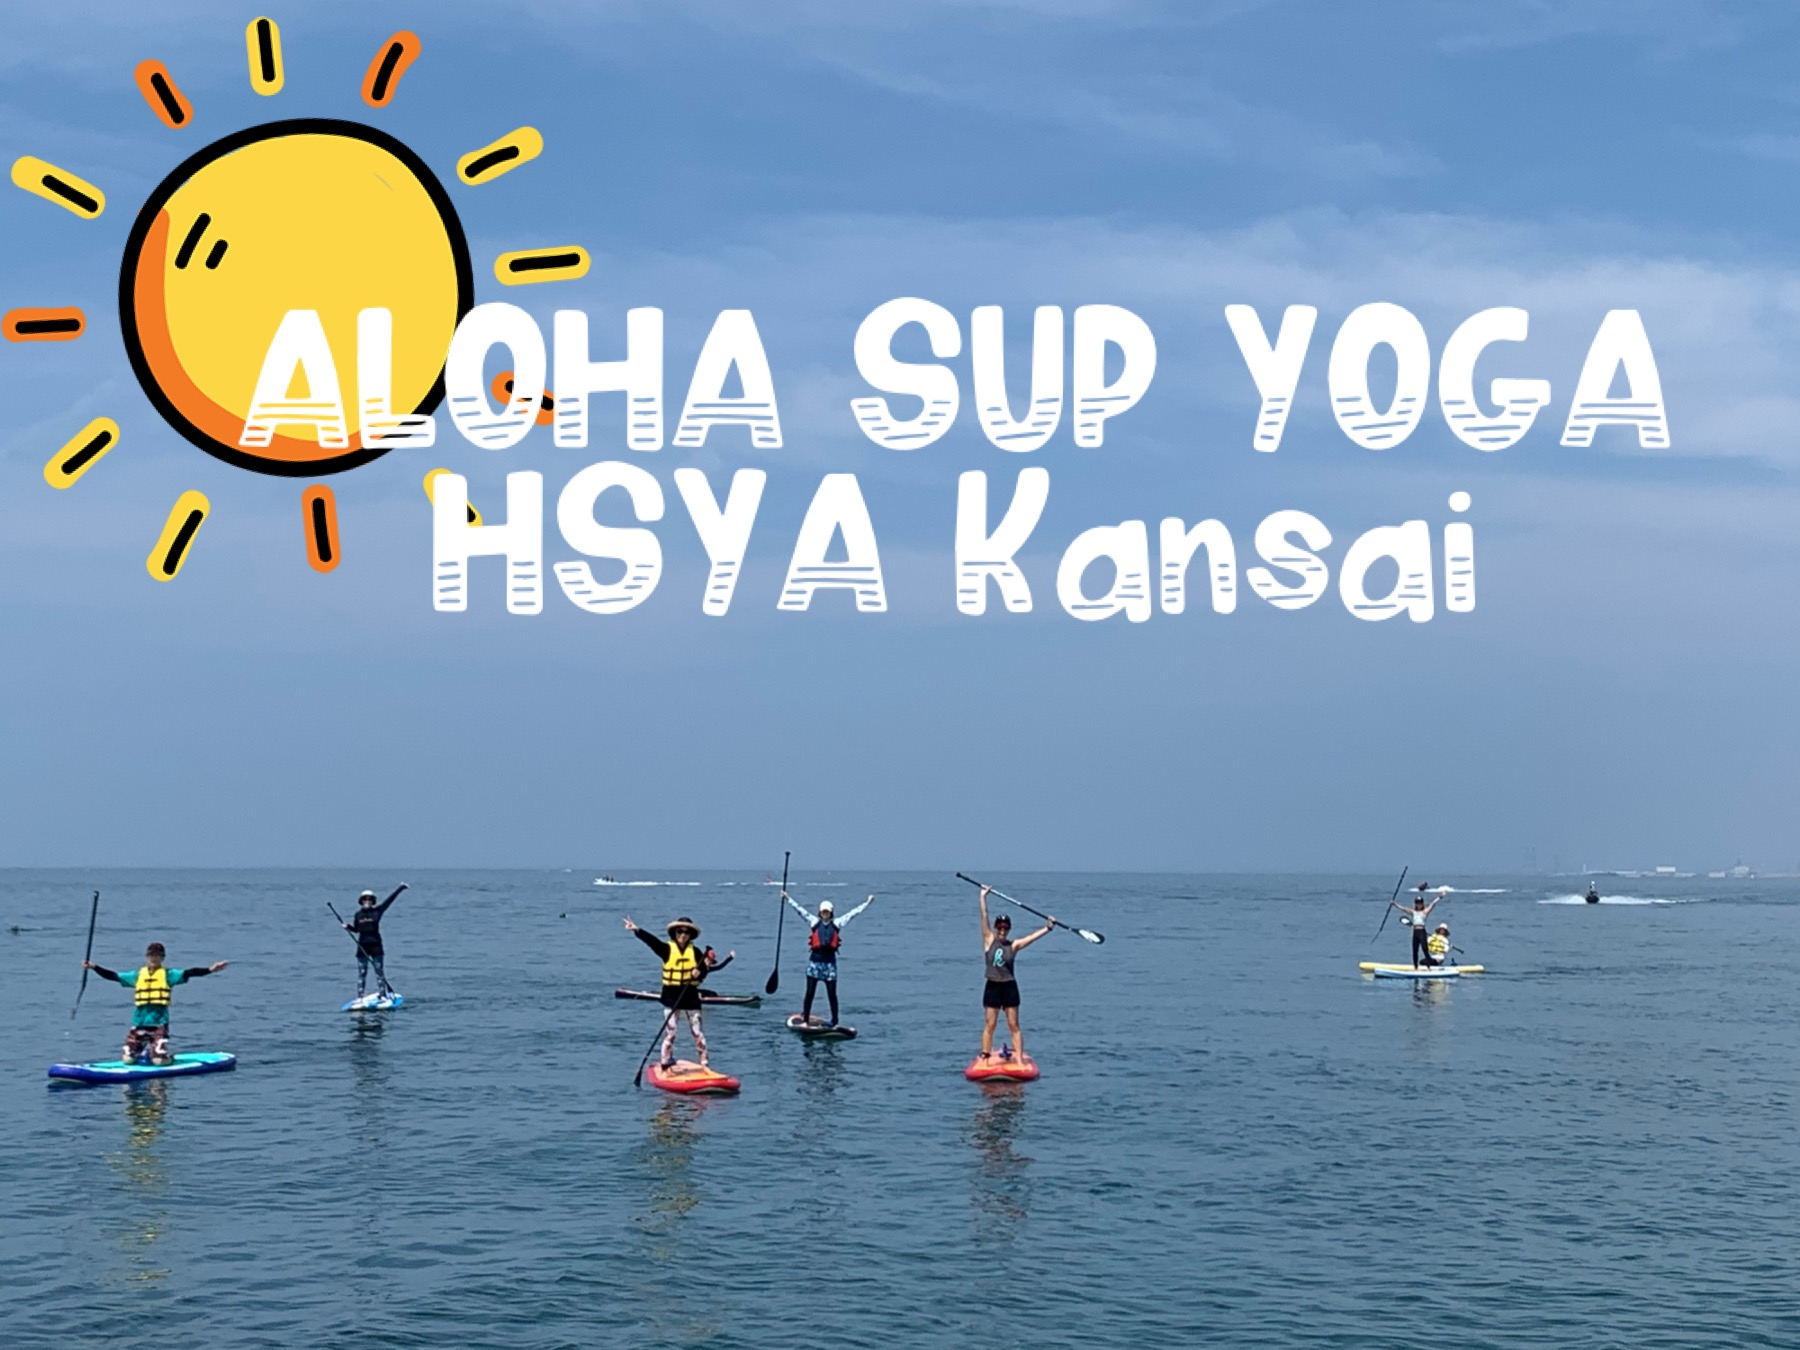 ALOHA SUP YOGA -HSYA Kansai-